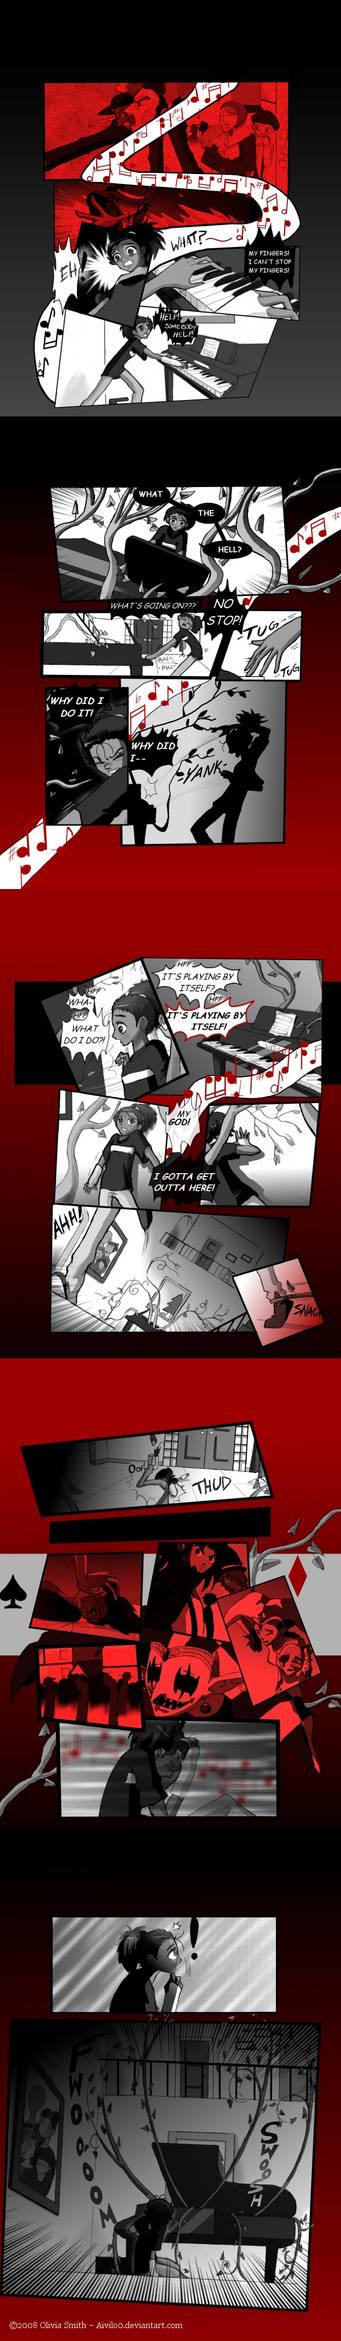 Animosity Sonata Page 40-44